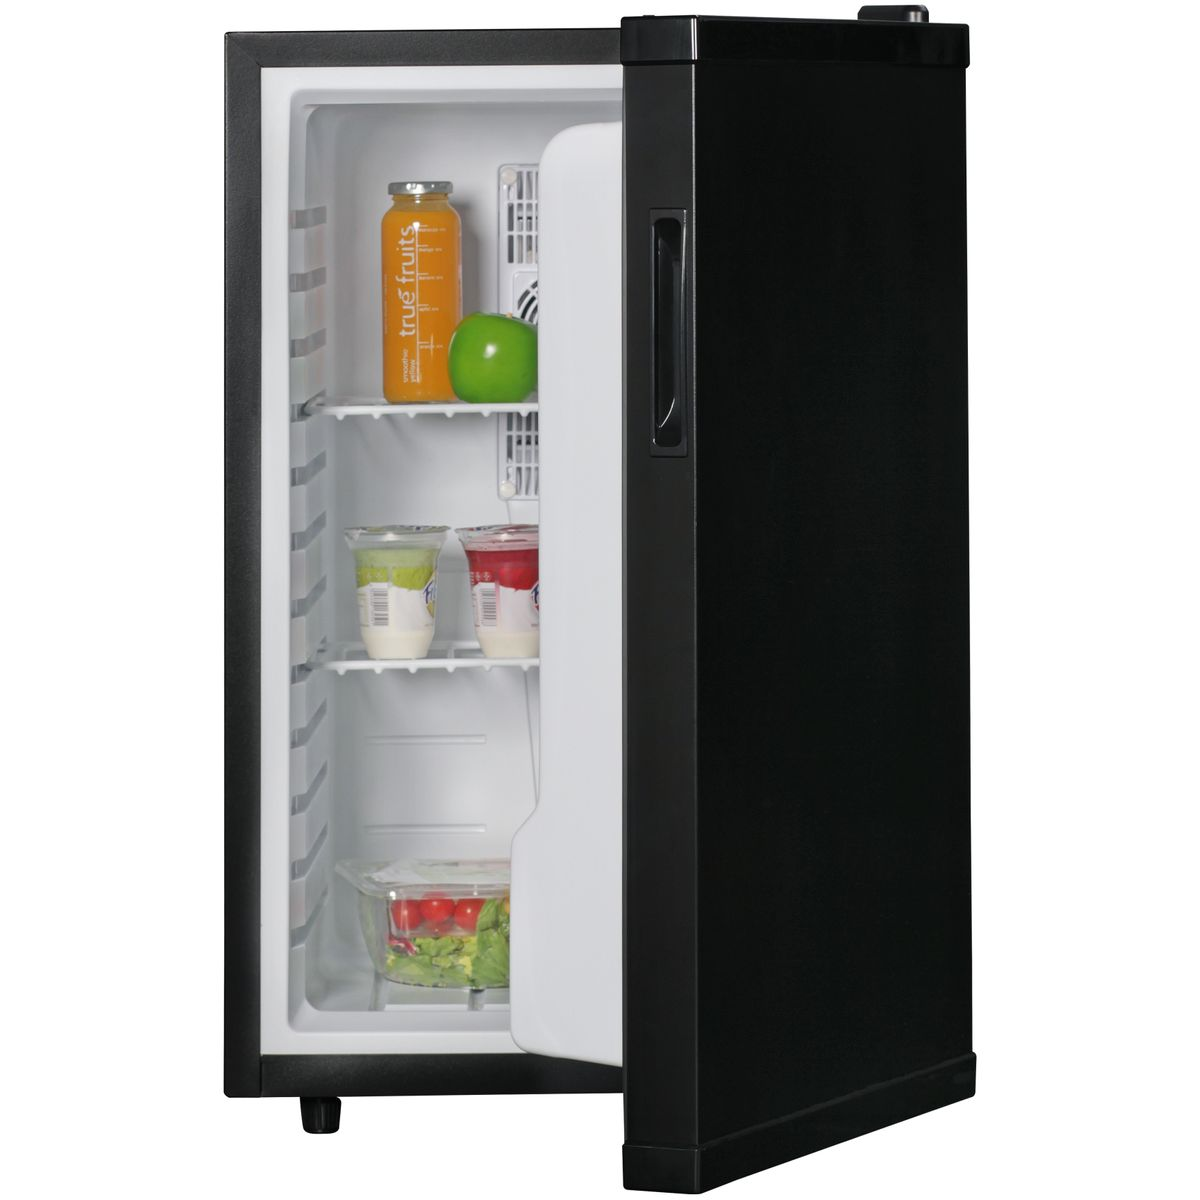 AMSTYLE Mini Kühlschrank 65 Liter / Minibar schwarz ...